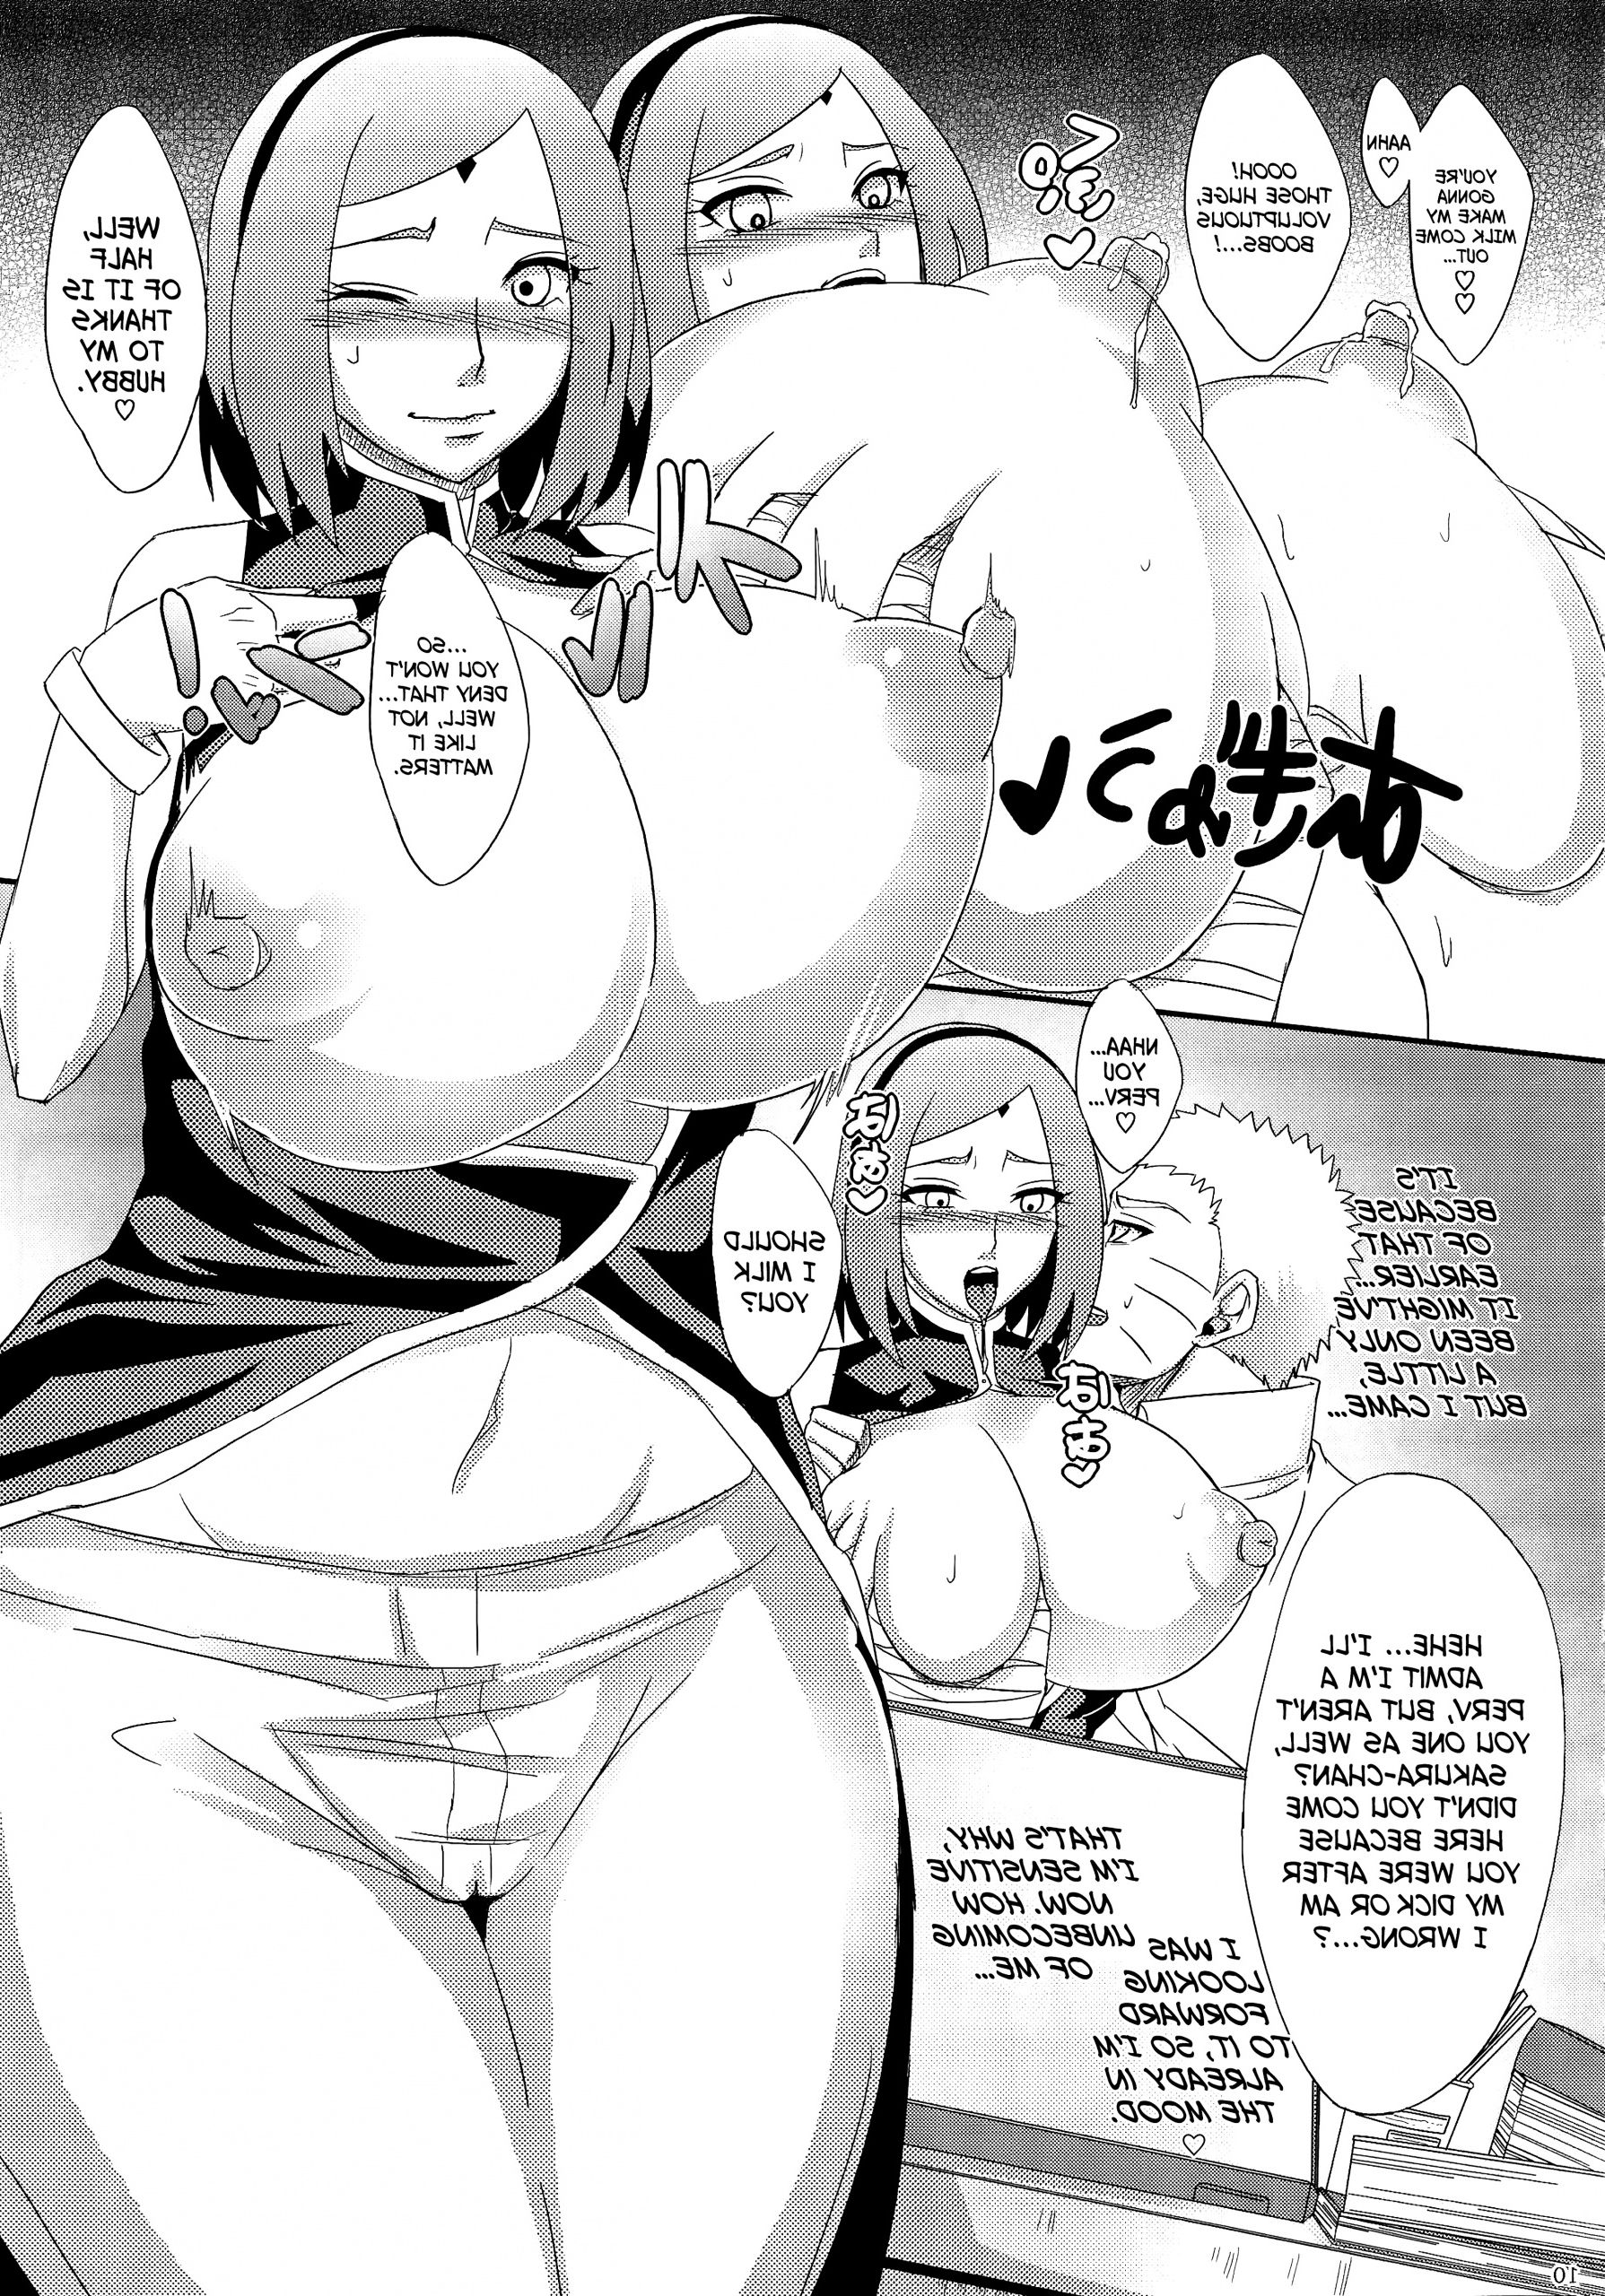 Magna/konoha_no_secret_service_2 image_7130.jpg